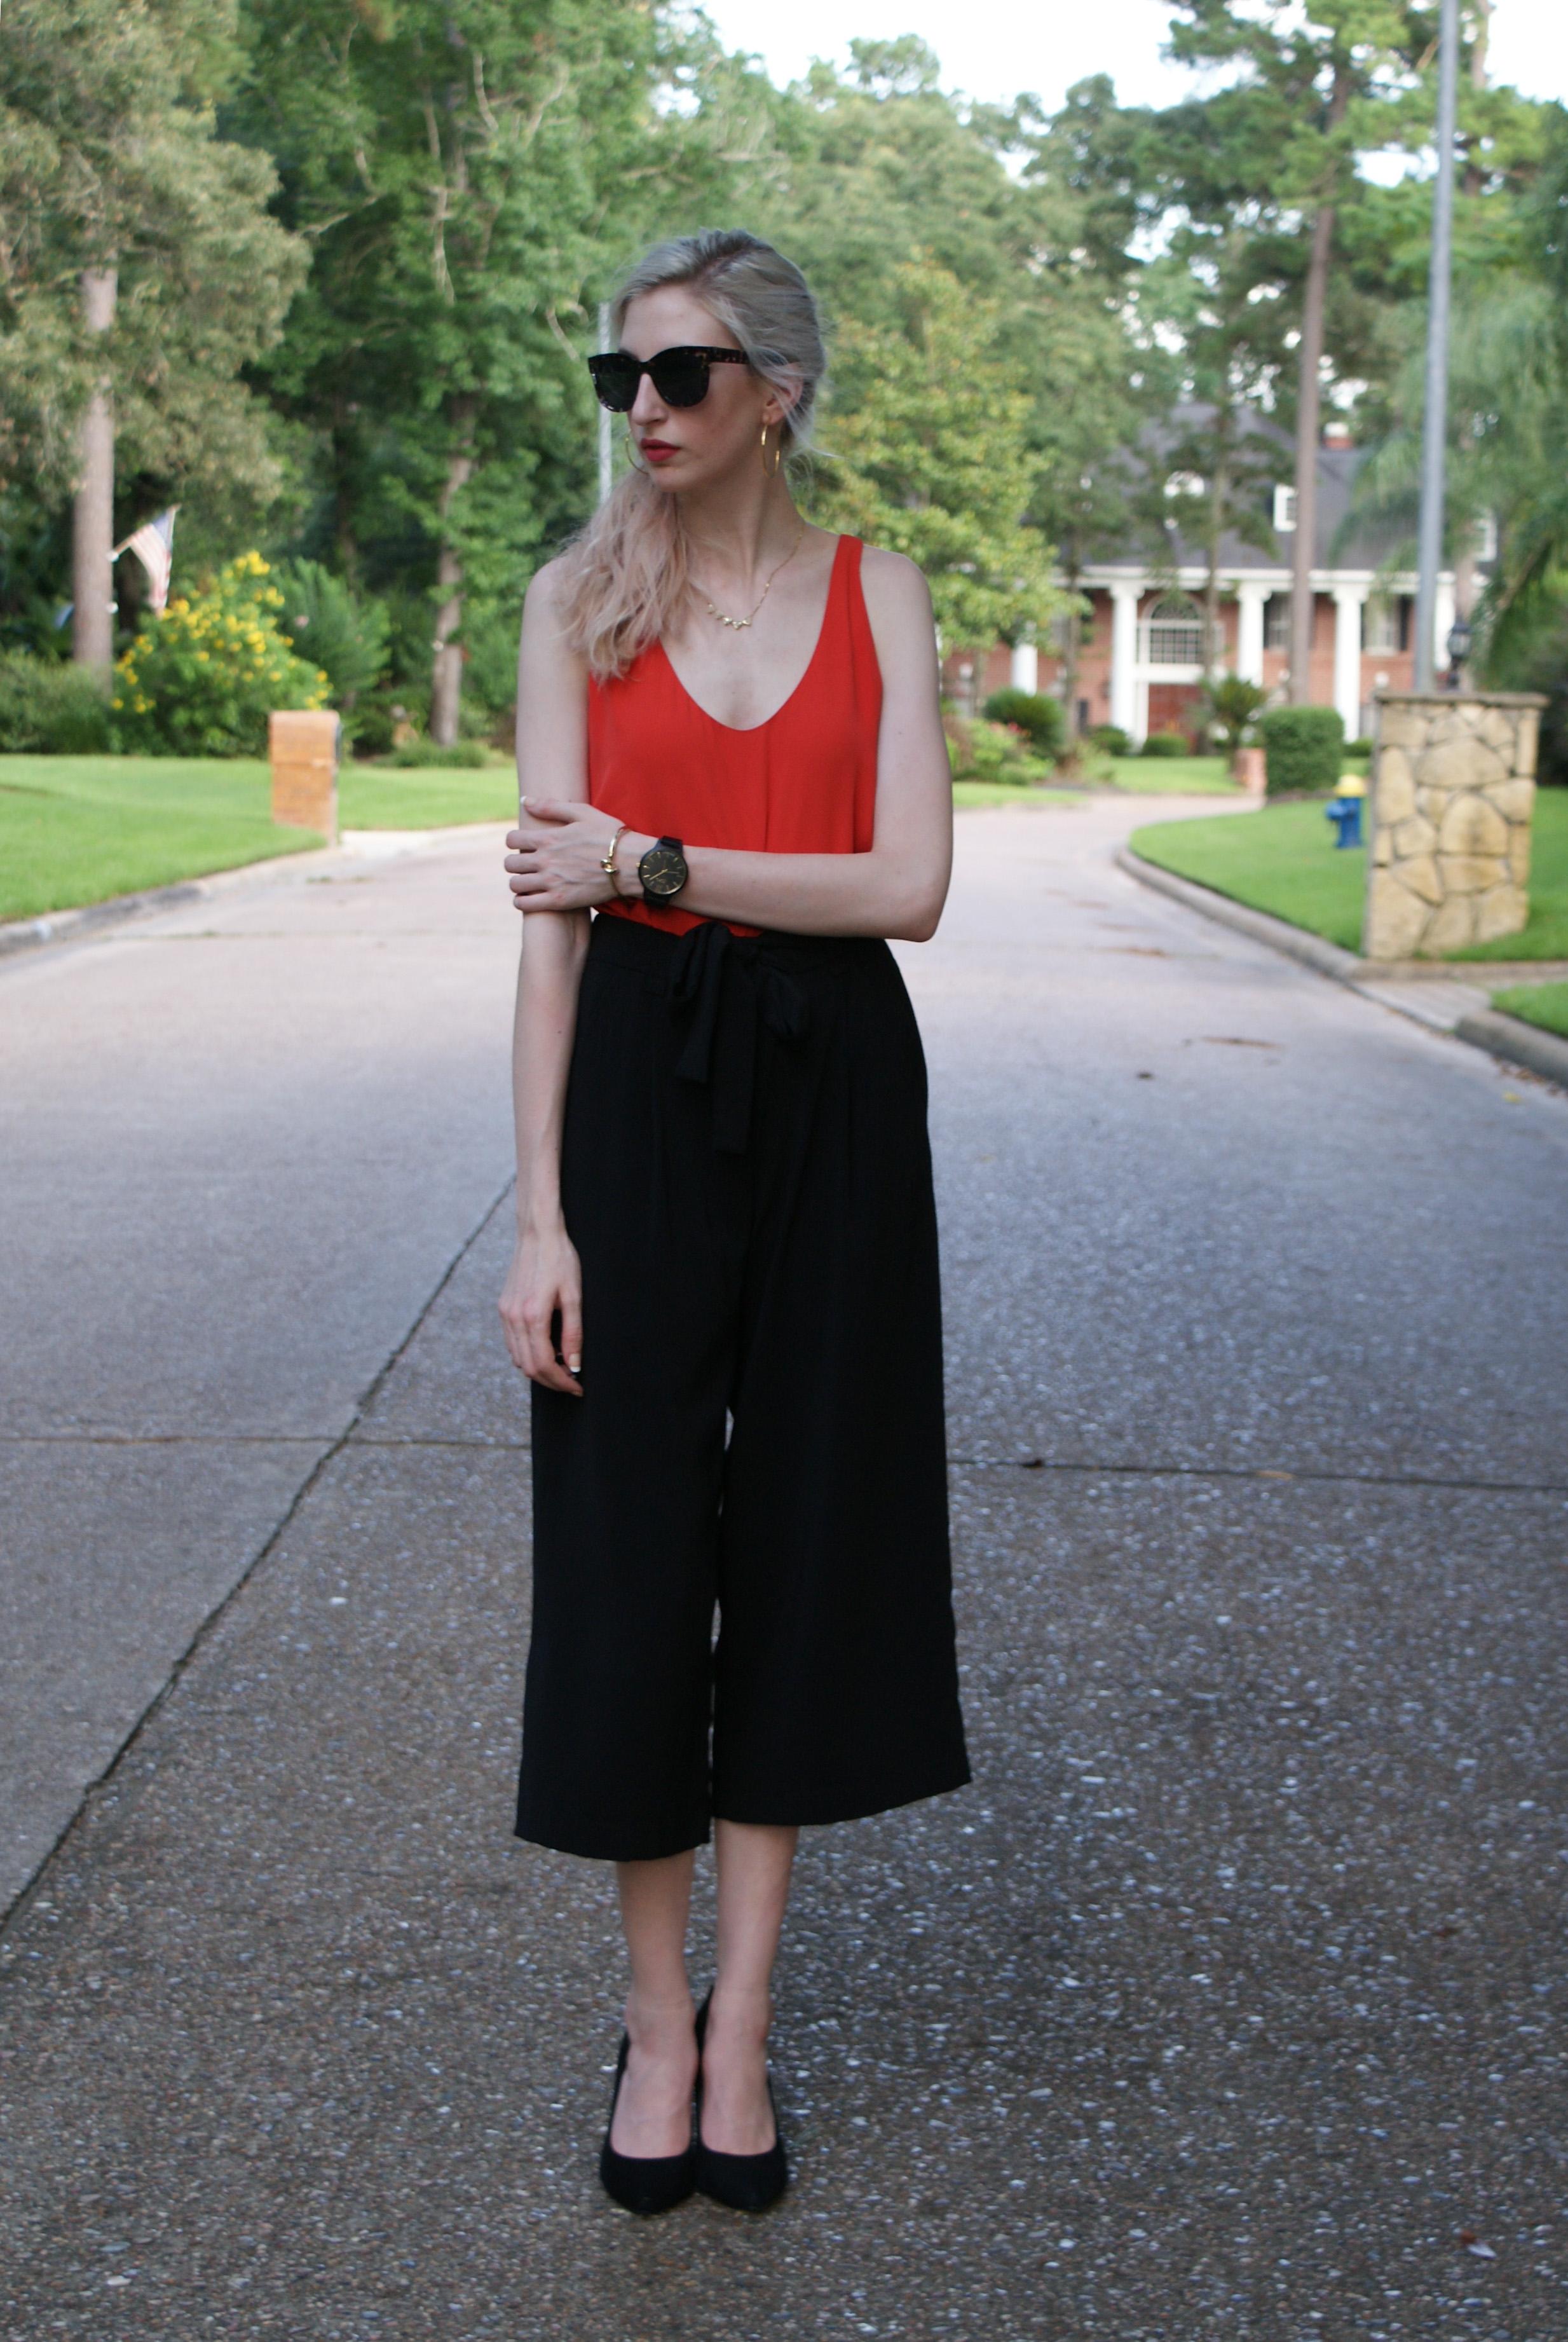 LOFT orange dress, zara culotte cropped wide leg pants, black suede pointed toe pumps, gold hoops, revlon hd matte lipstick